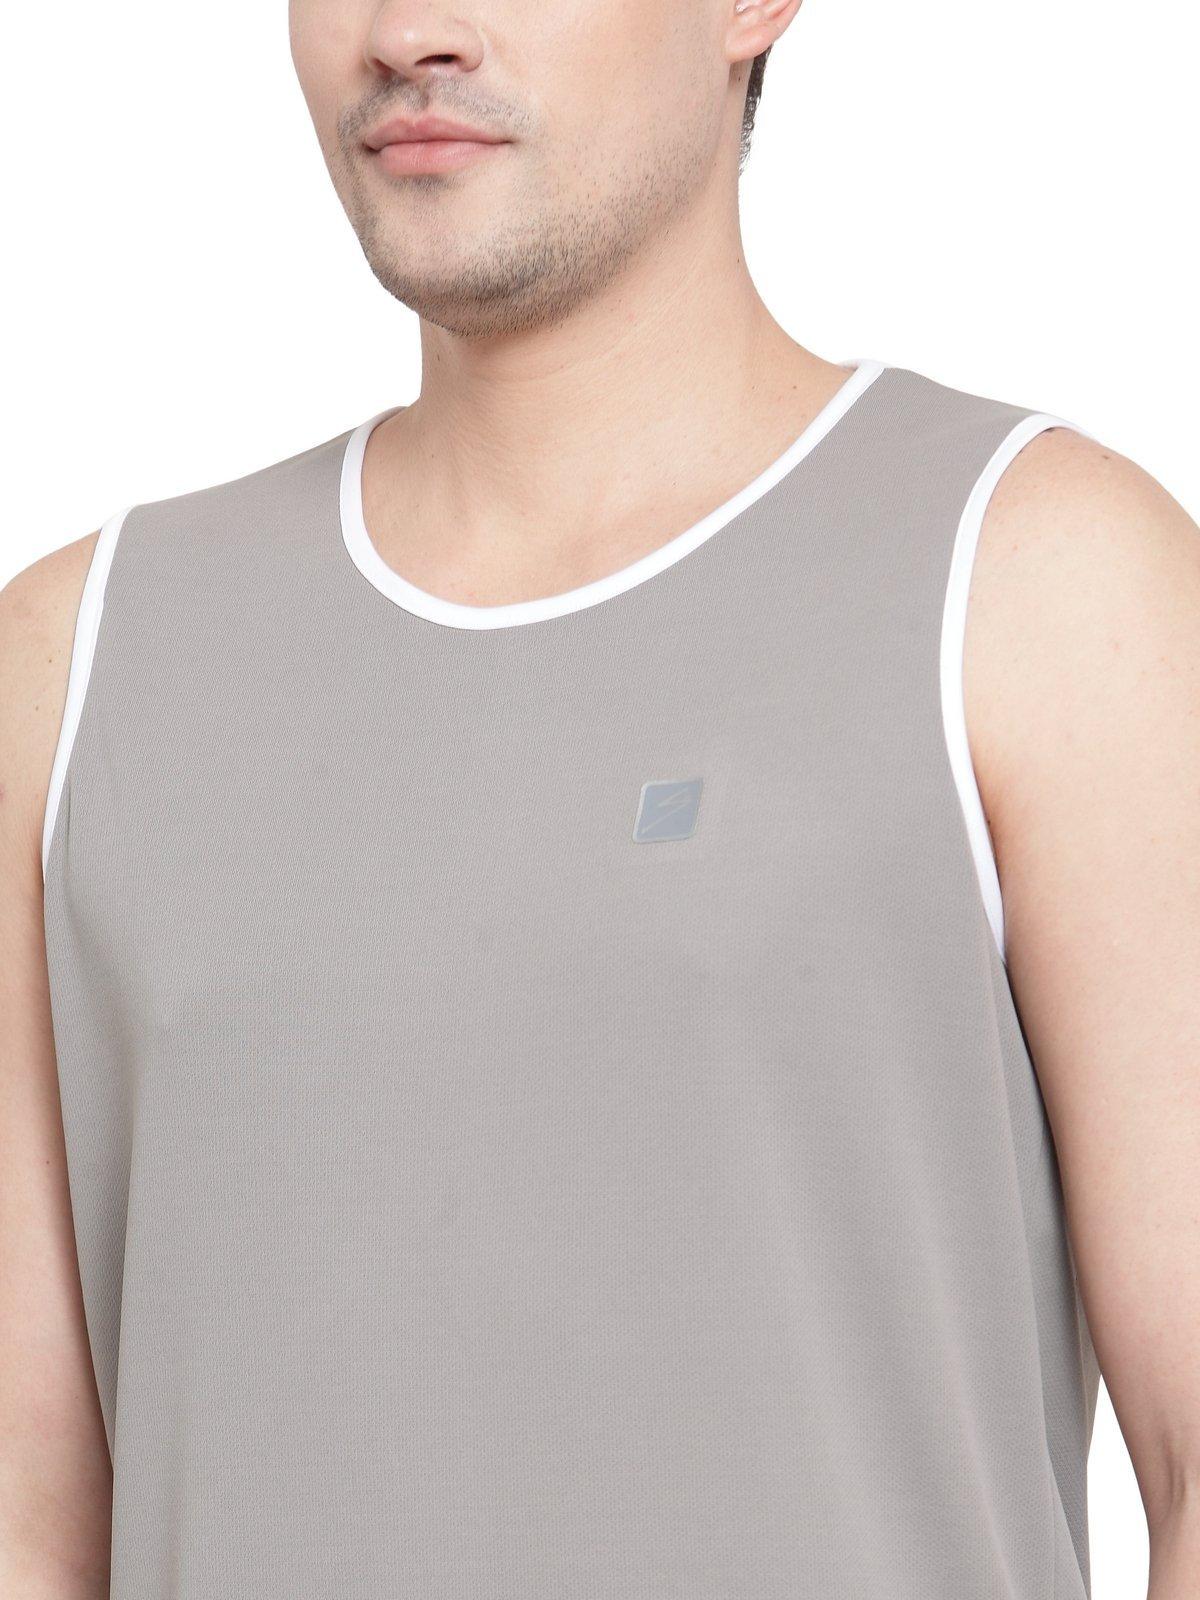 coolmax grey